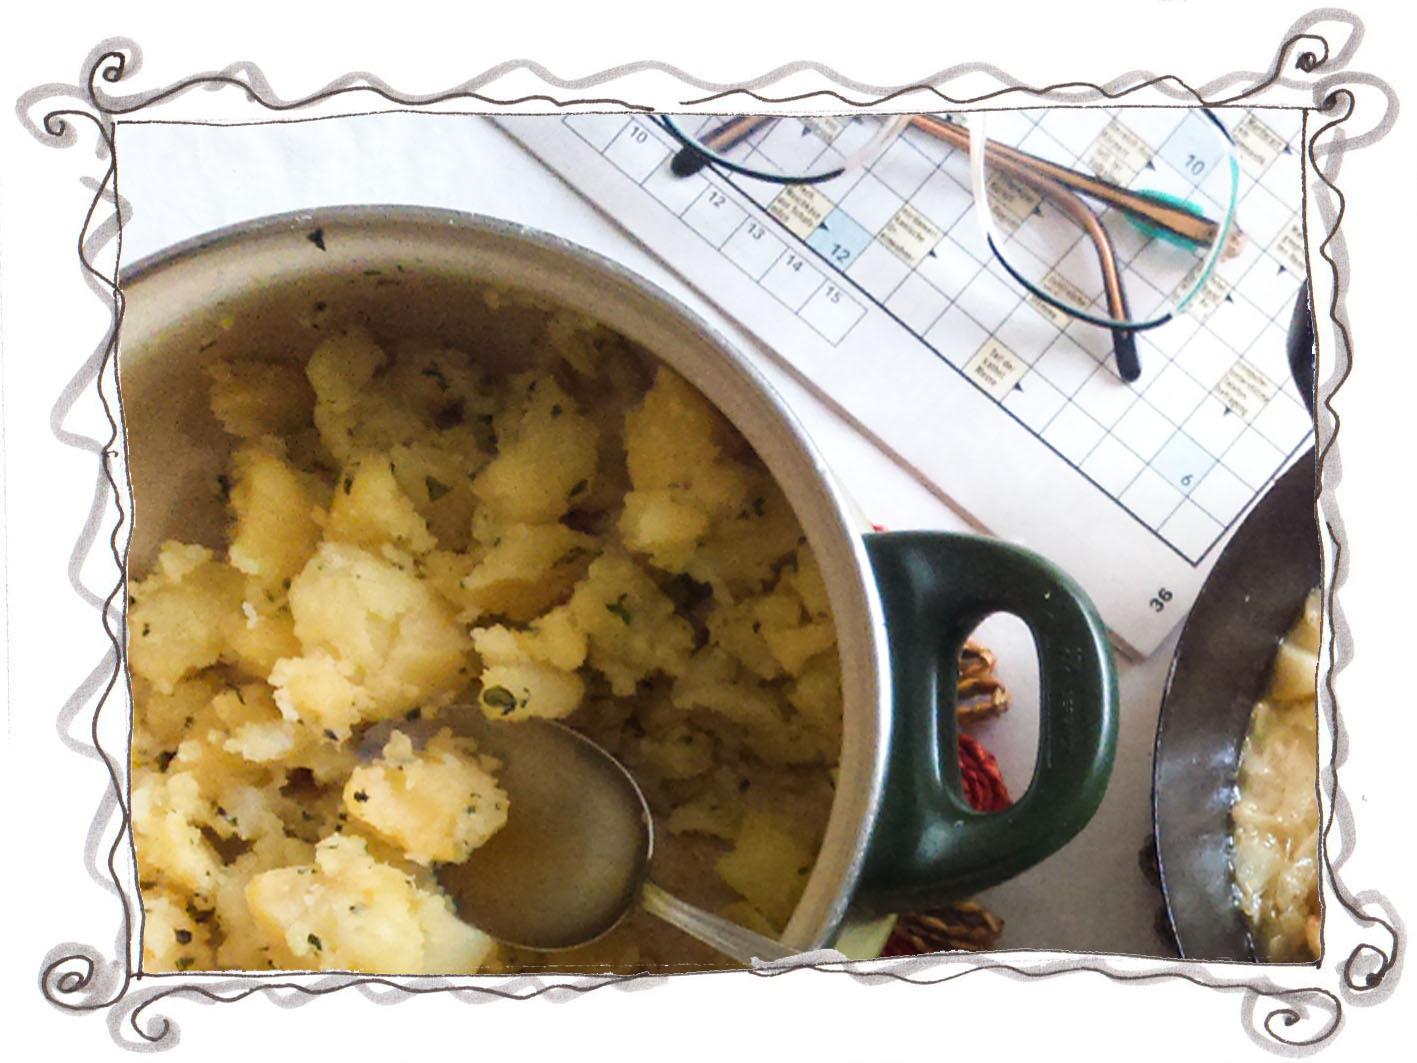 Parsley Potatoes - Petersilerdäpfel